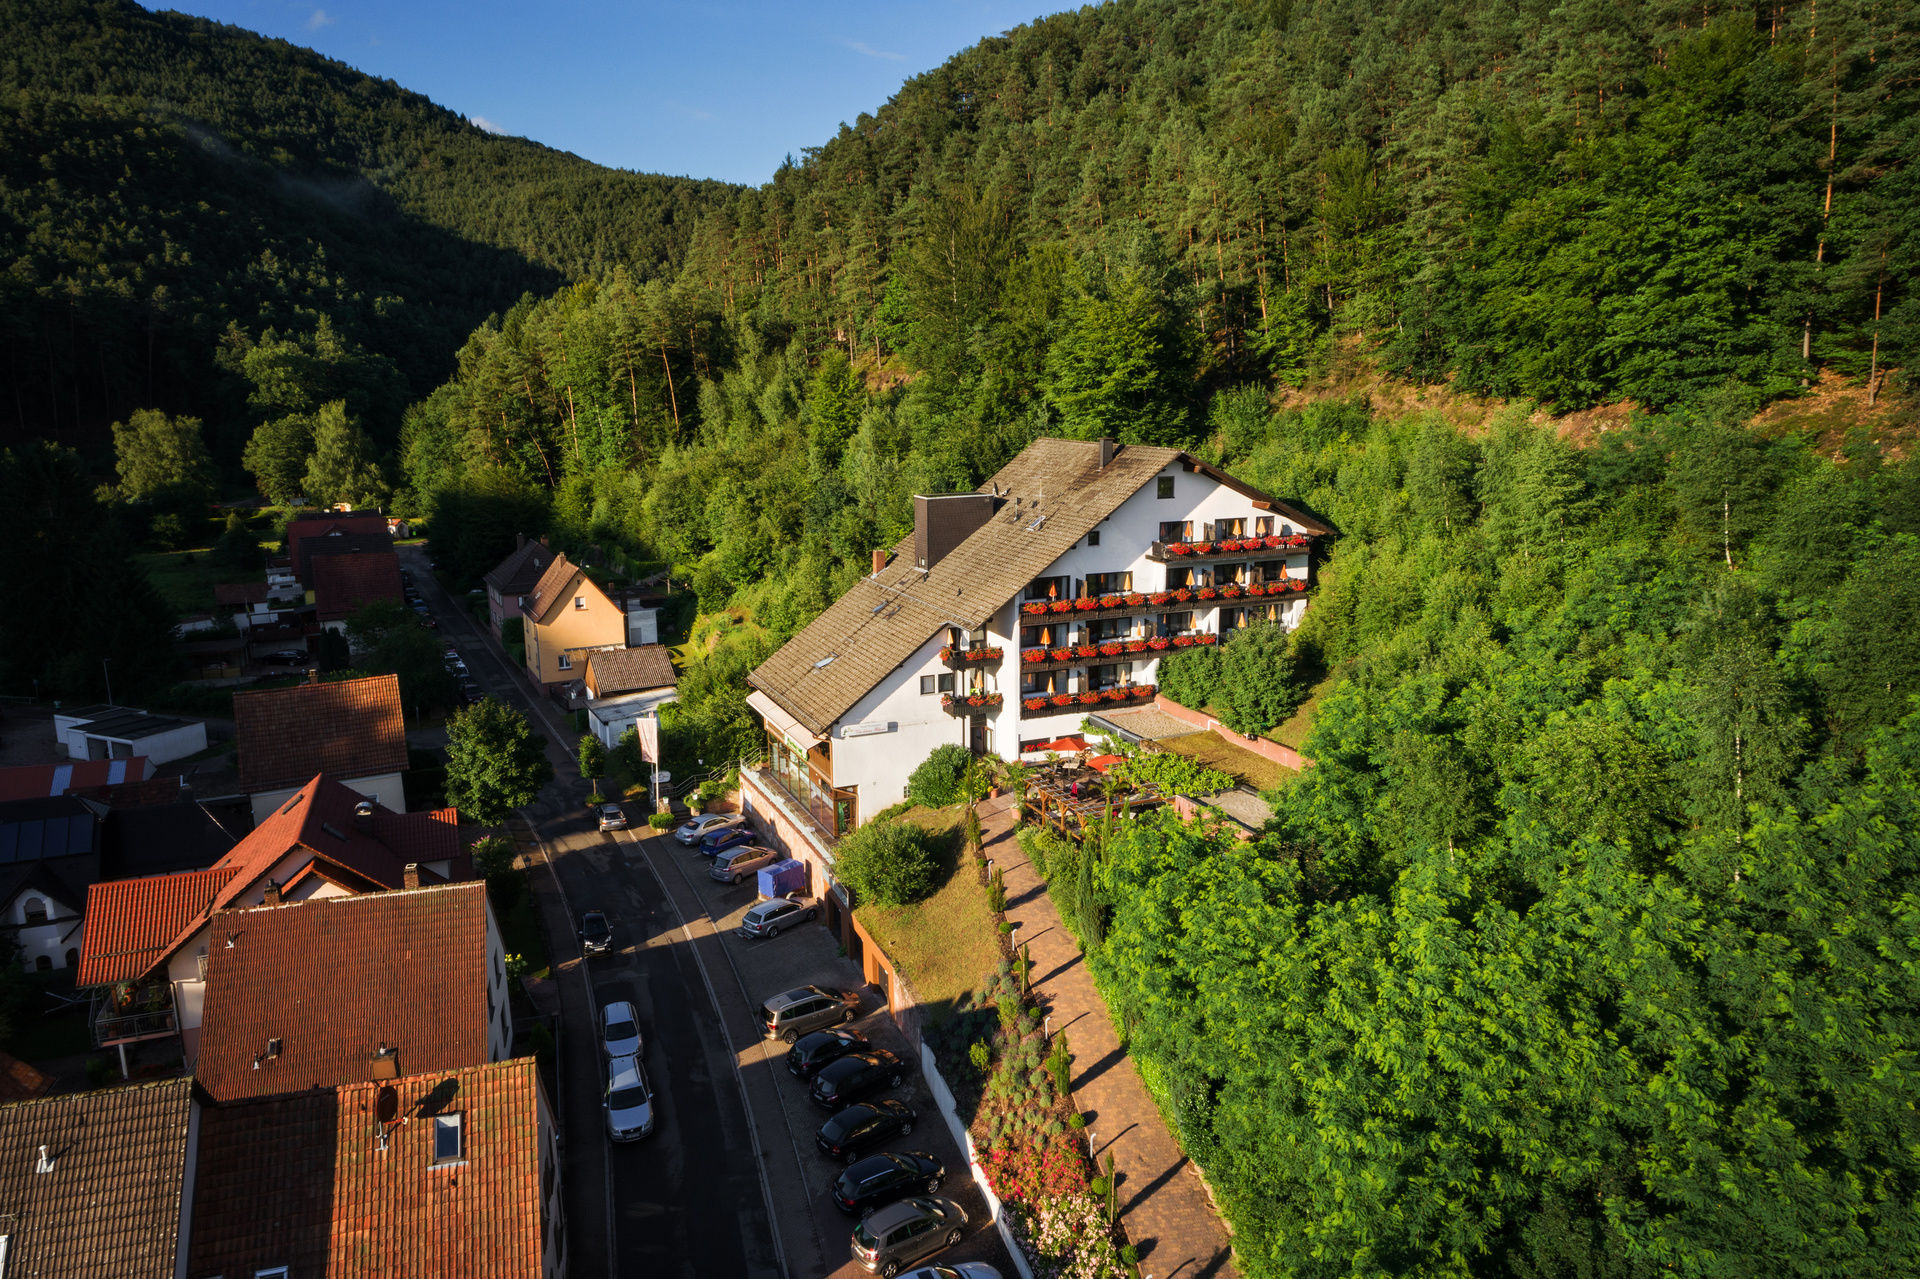 3 Sterne Hotel In Erfweiler Pfalz Dahner Felsenland Naturpark